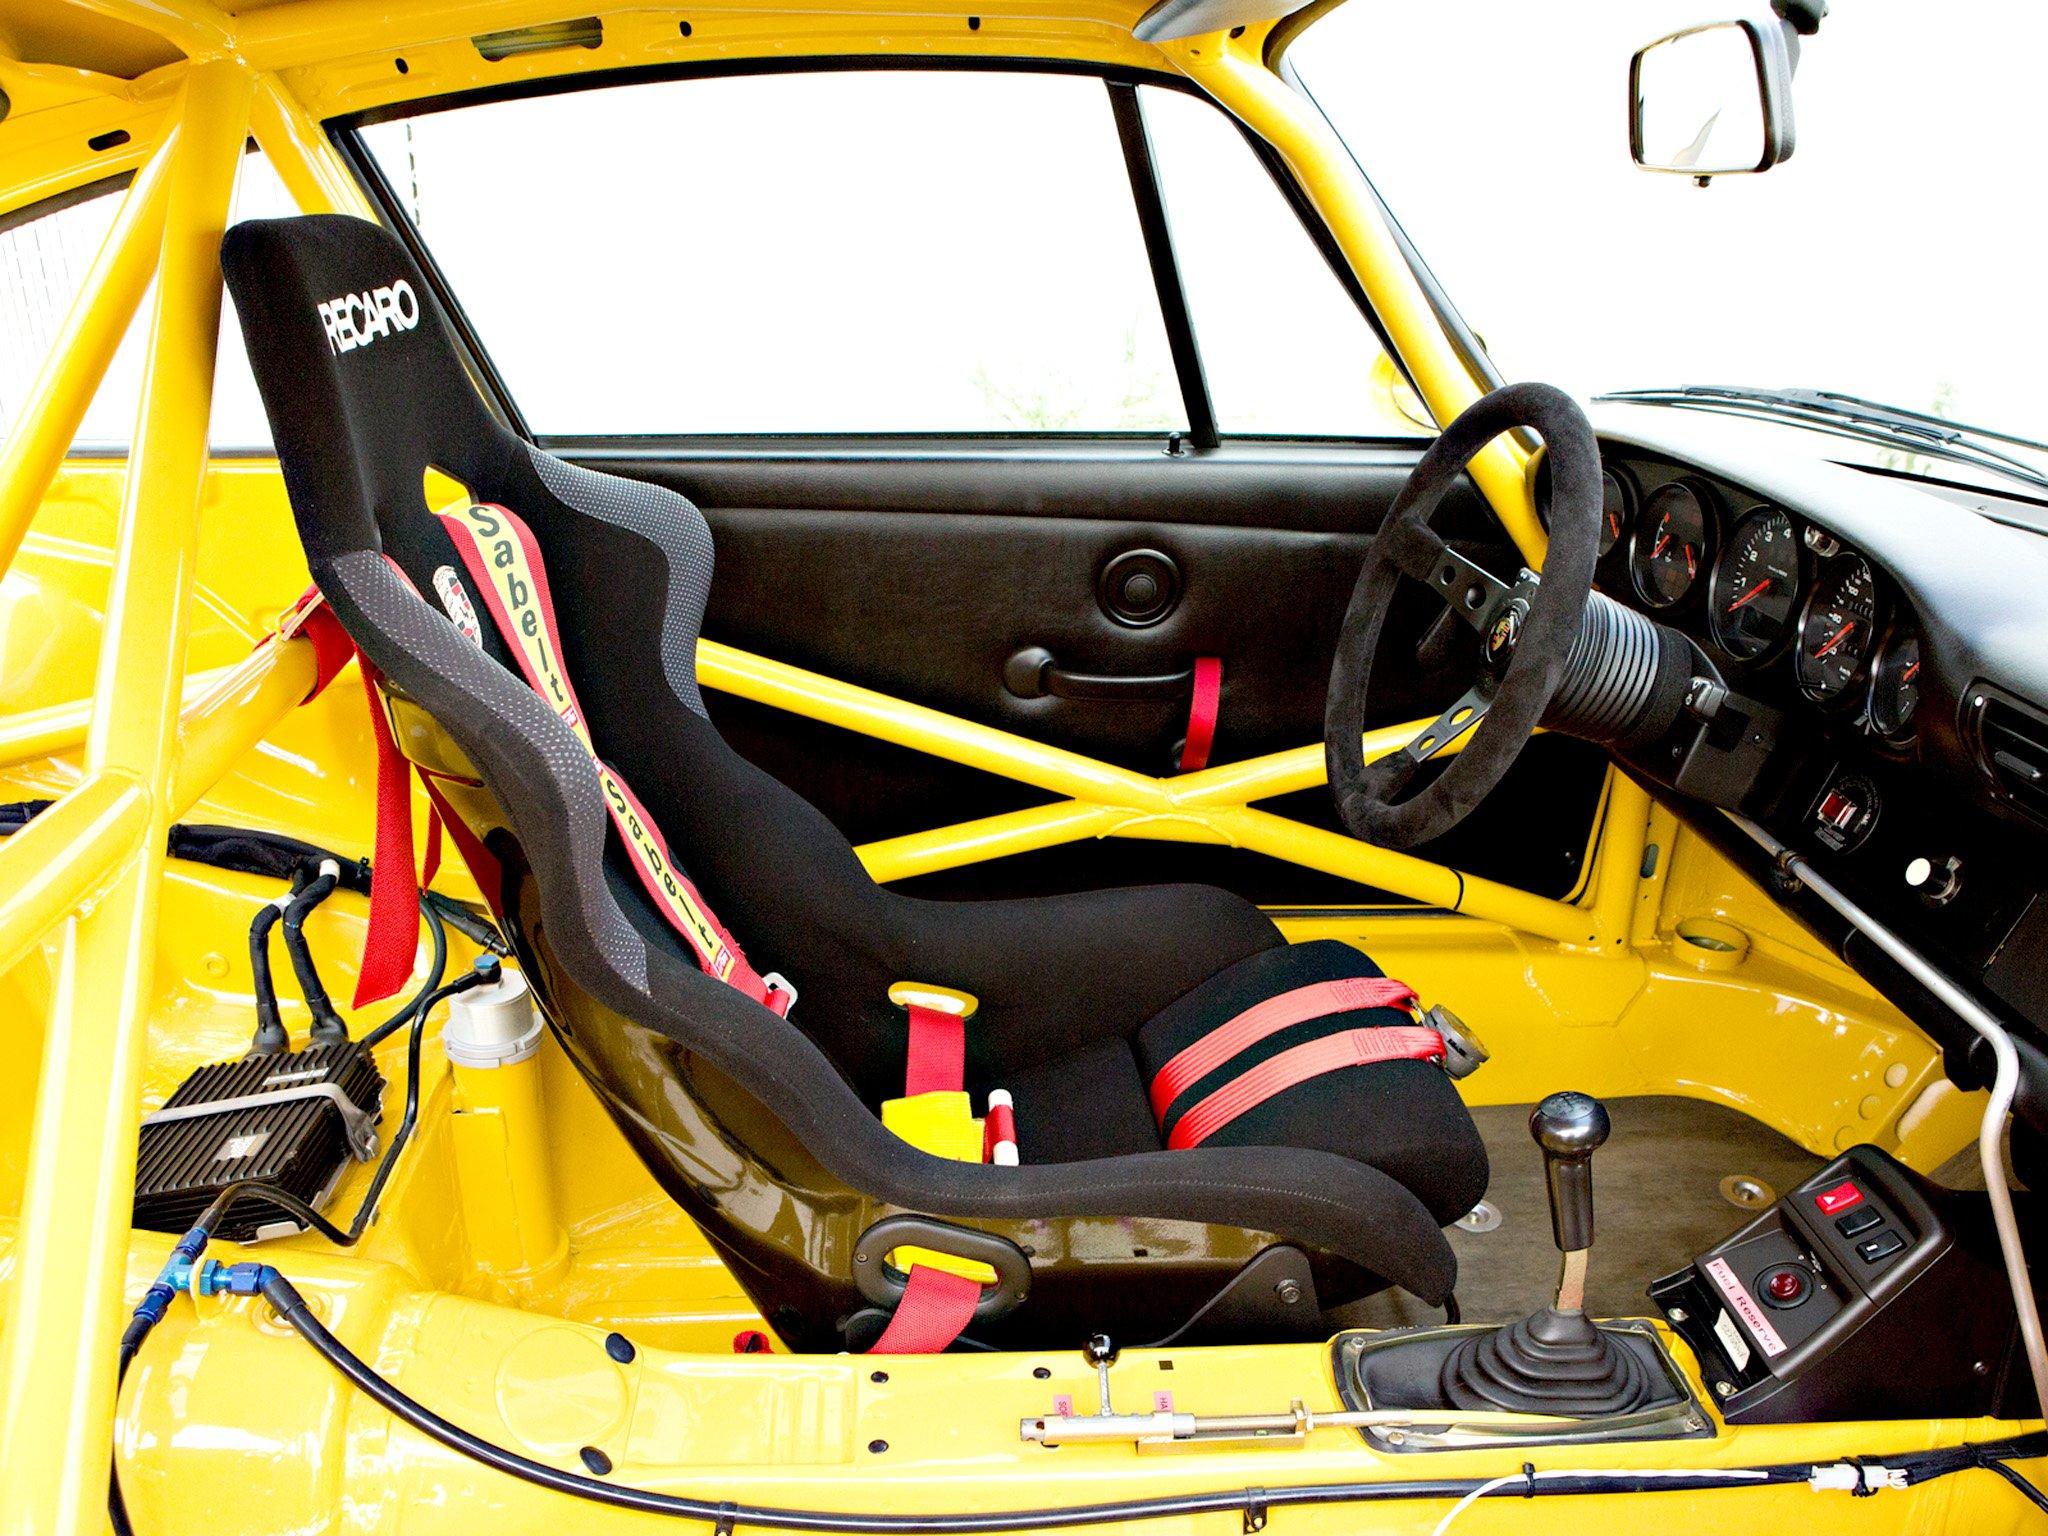 1995 98 porsche 911 gt2 evo 993 supercar race racing f wallpaper 2048x1536 384169. Black Bedroom Furniture Sets. Home Design Ideas